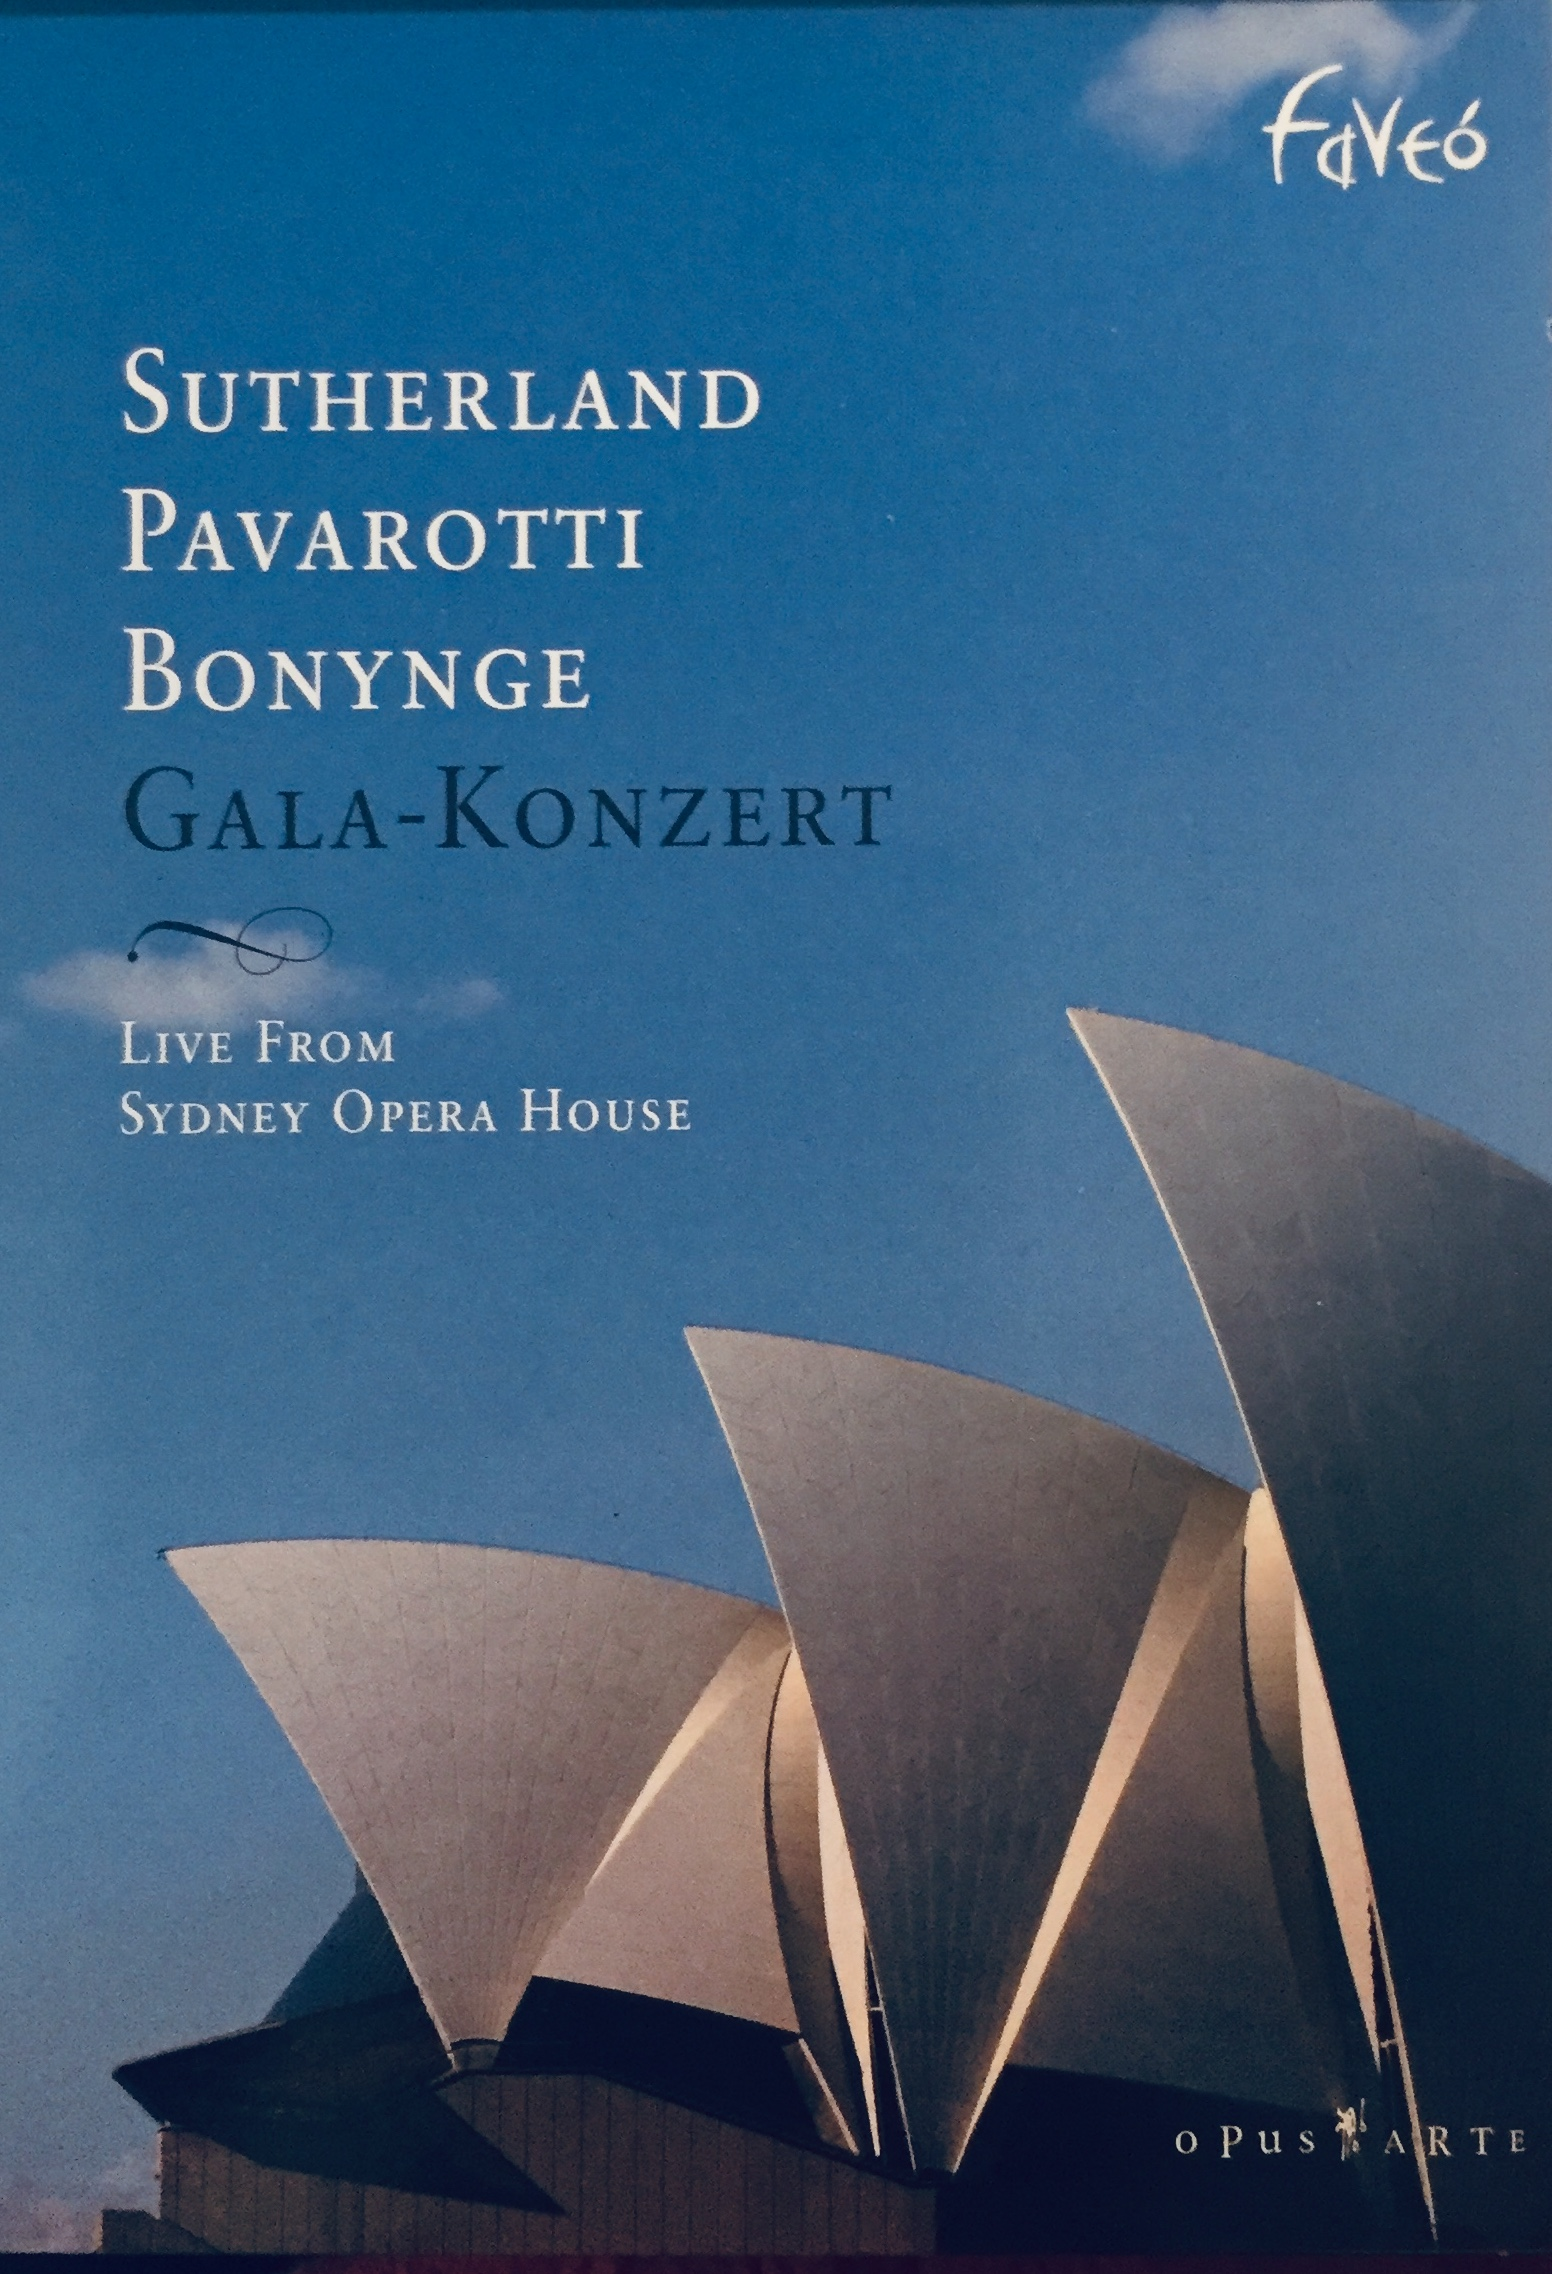 Sutherland Pavarotti Bonynge - Gala-Konzert - DVD /plast v šubru/